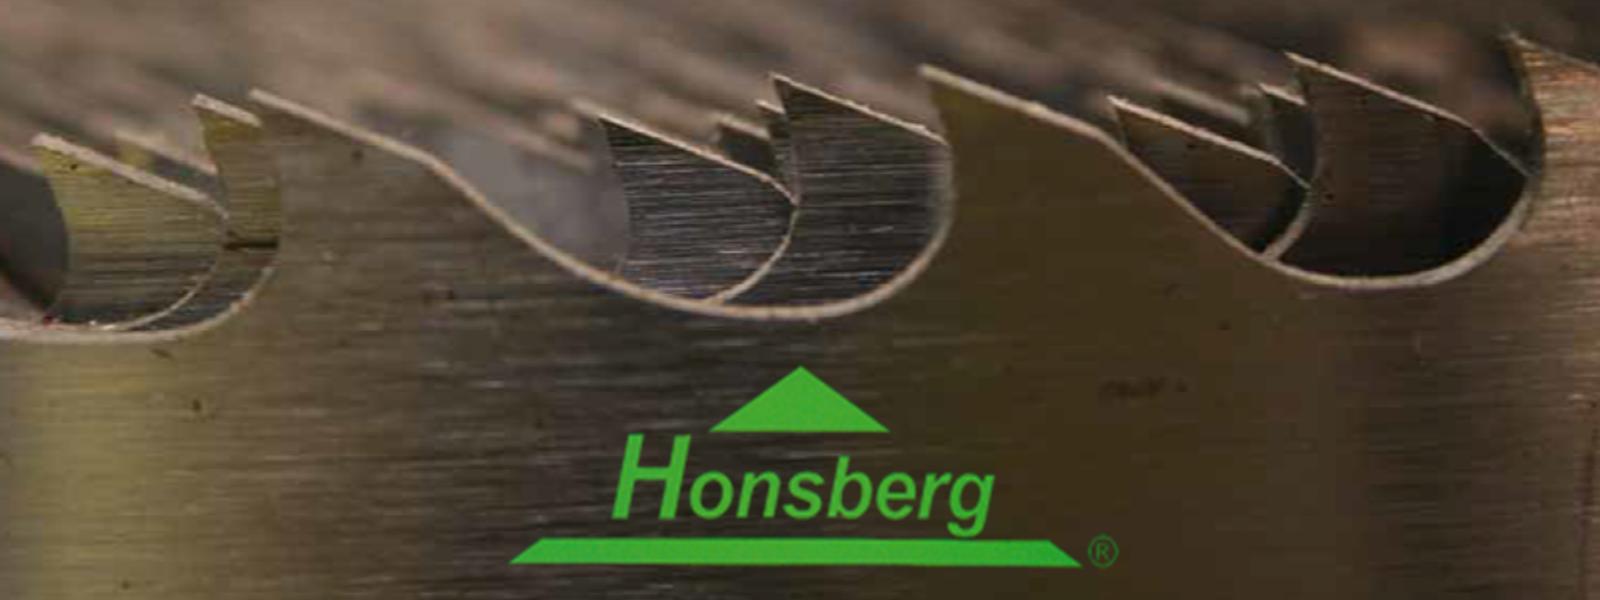 Honsberg Band Saw Blades